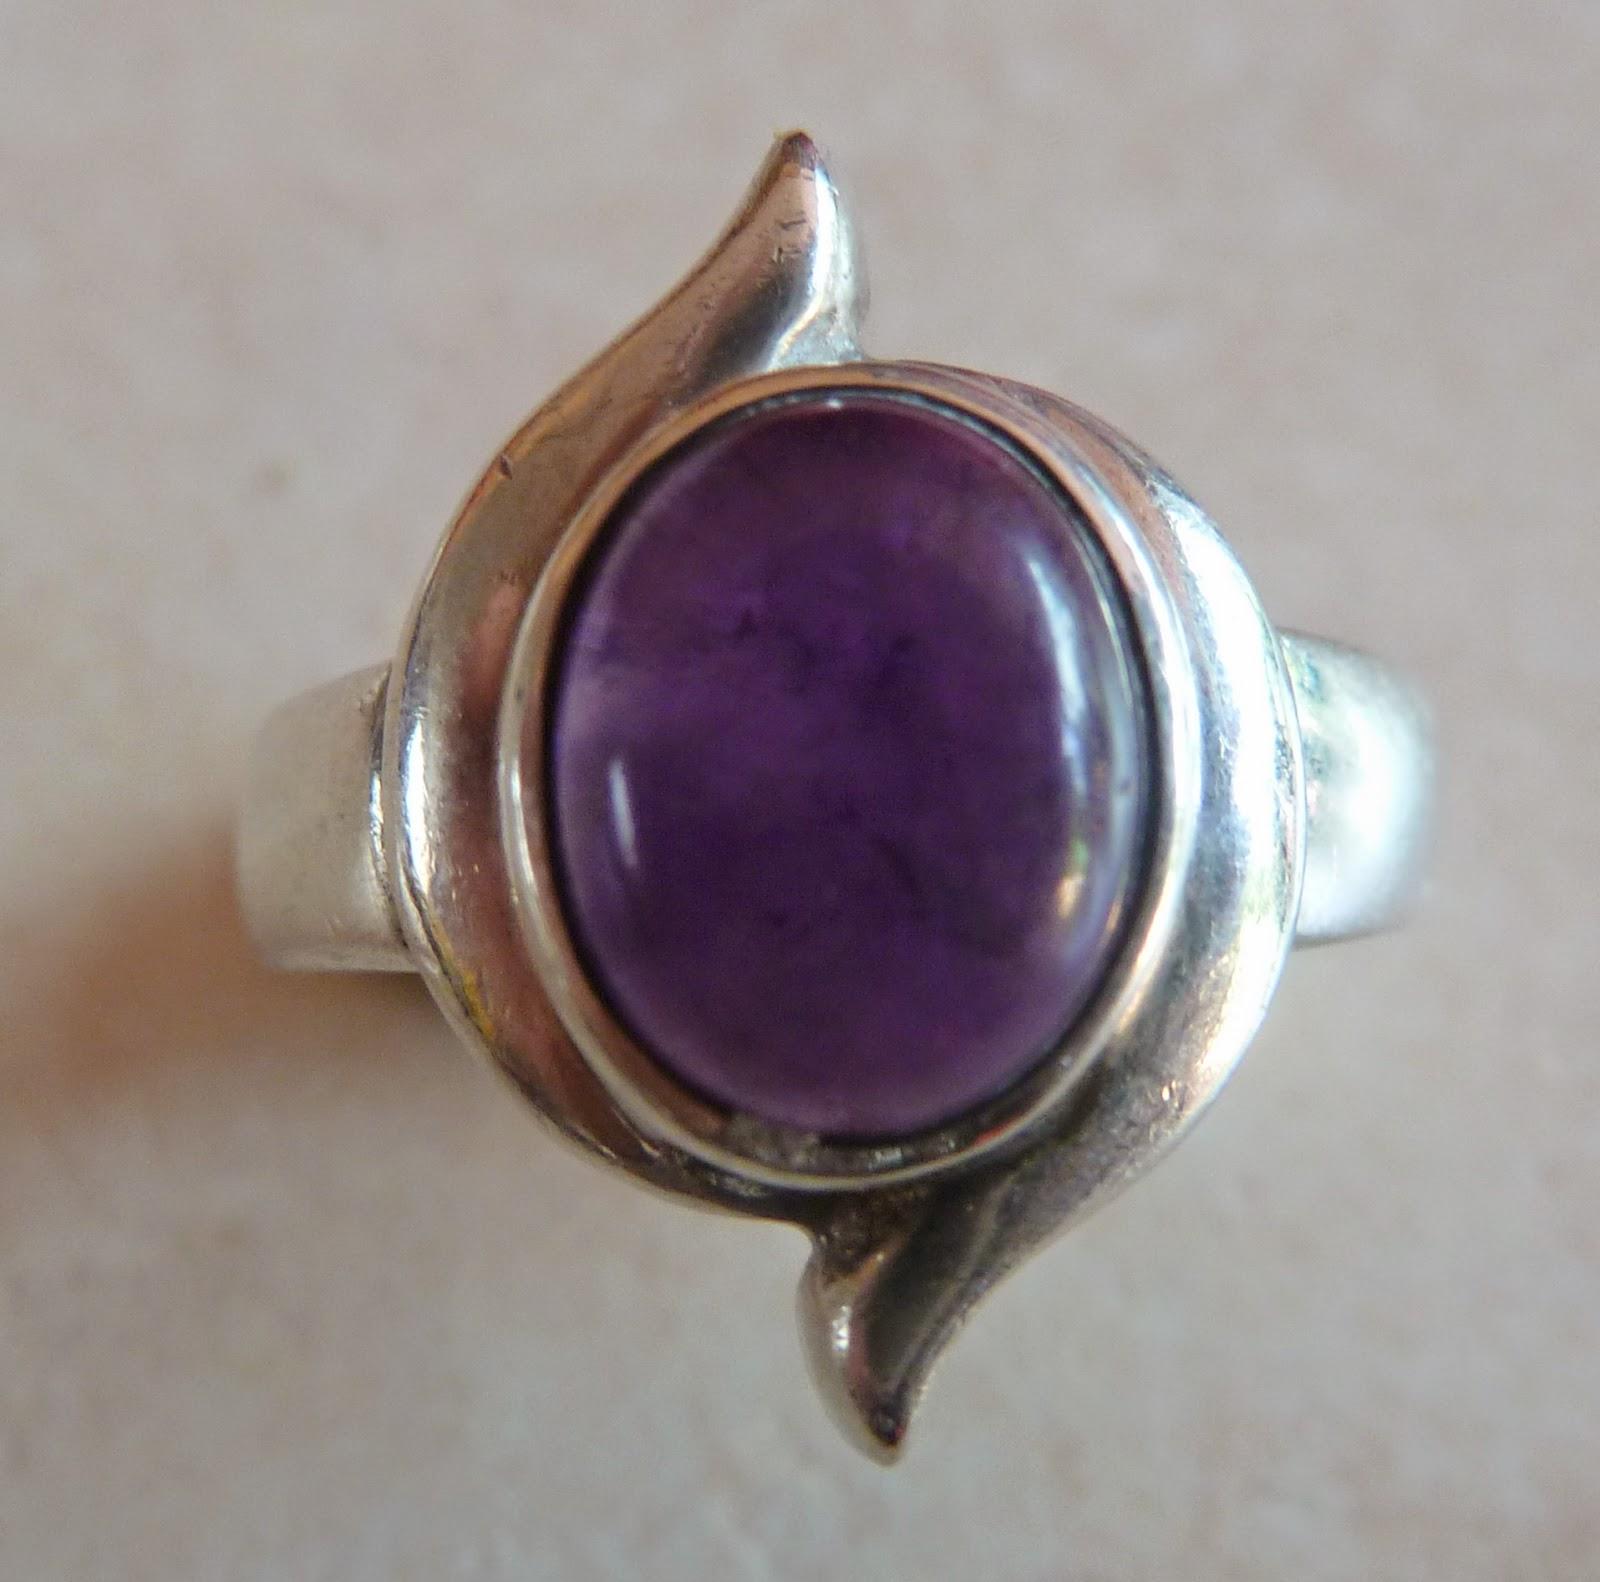 http://www.kcavintagegems.uk/sterling-silver-and-amethyst--modernist-style-vintage-ring-67-p.asp